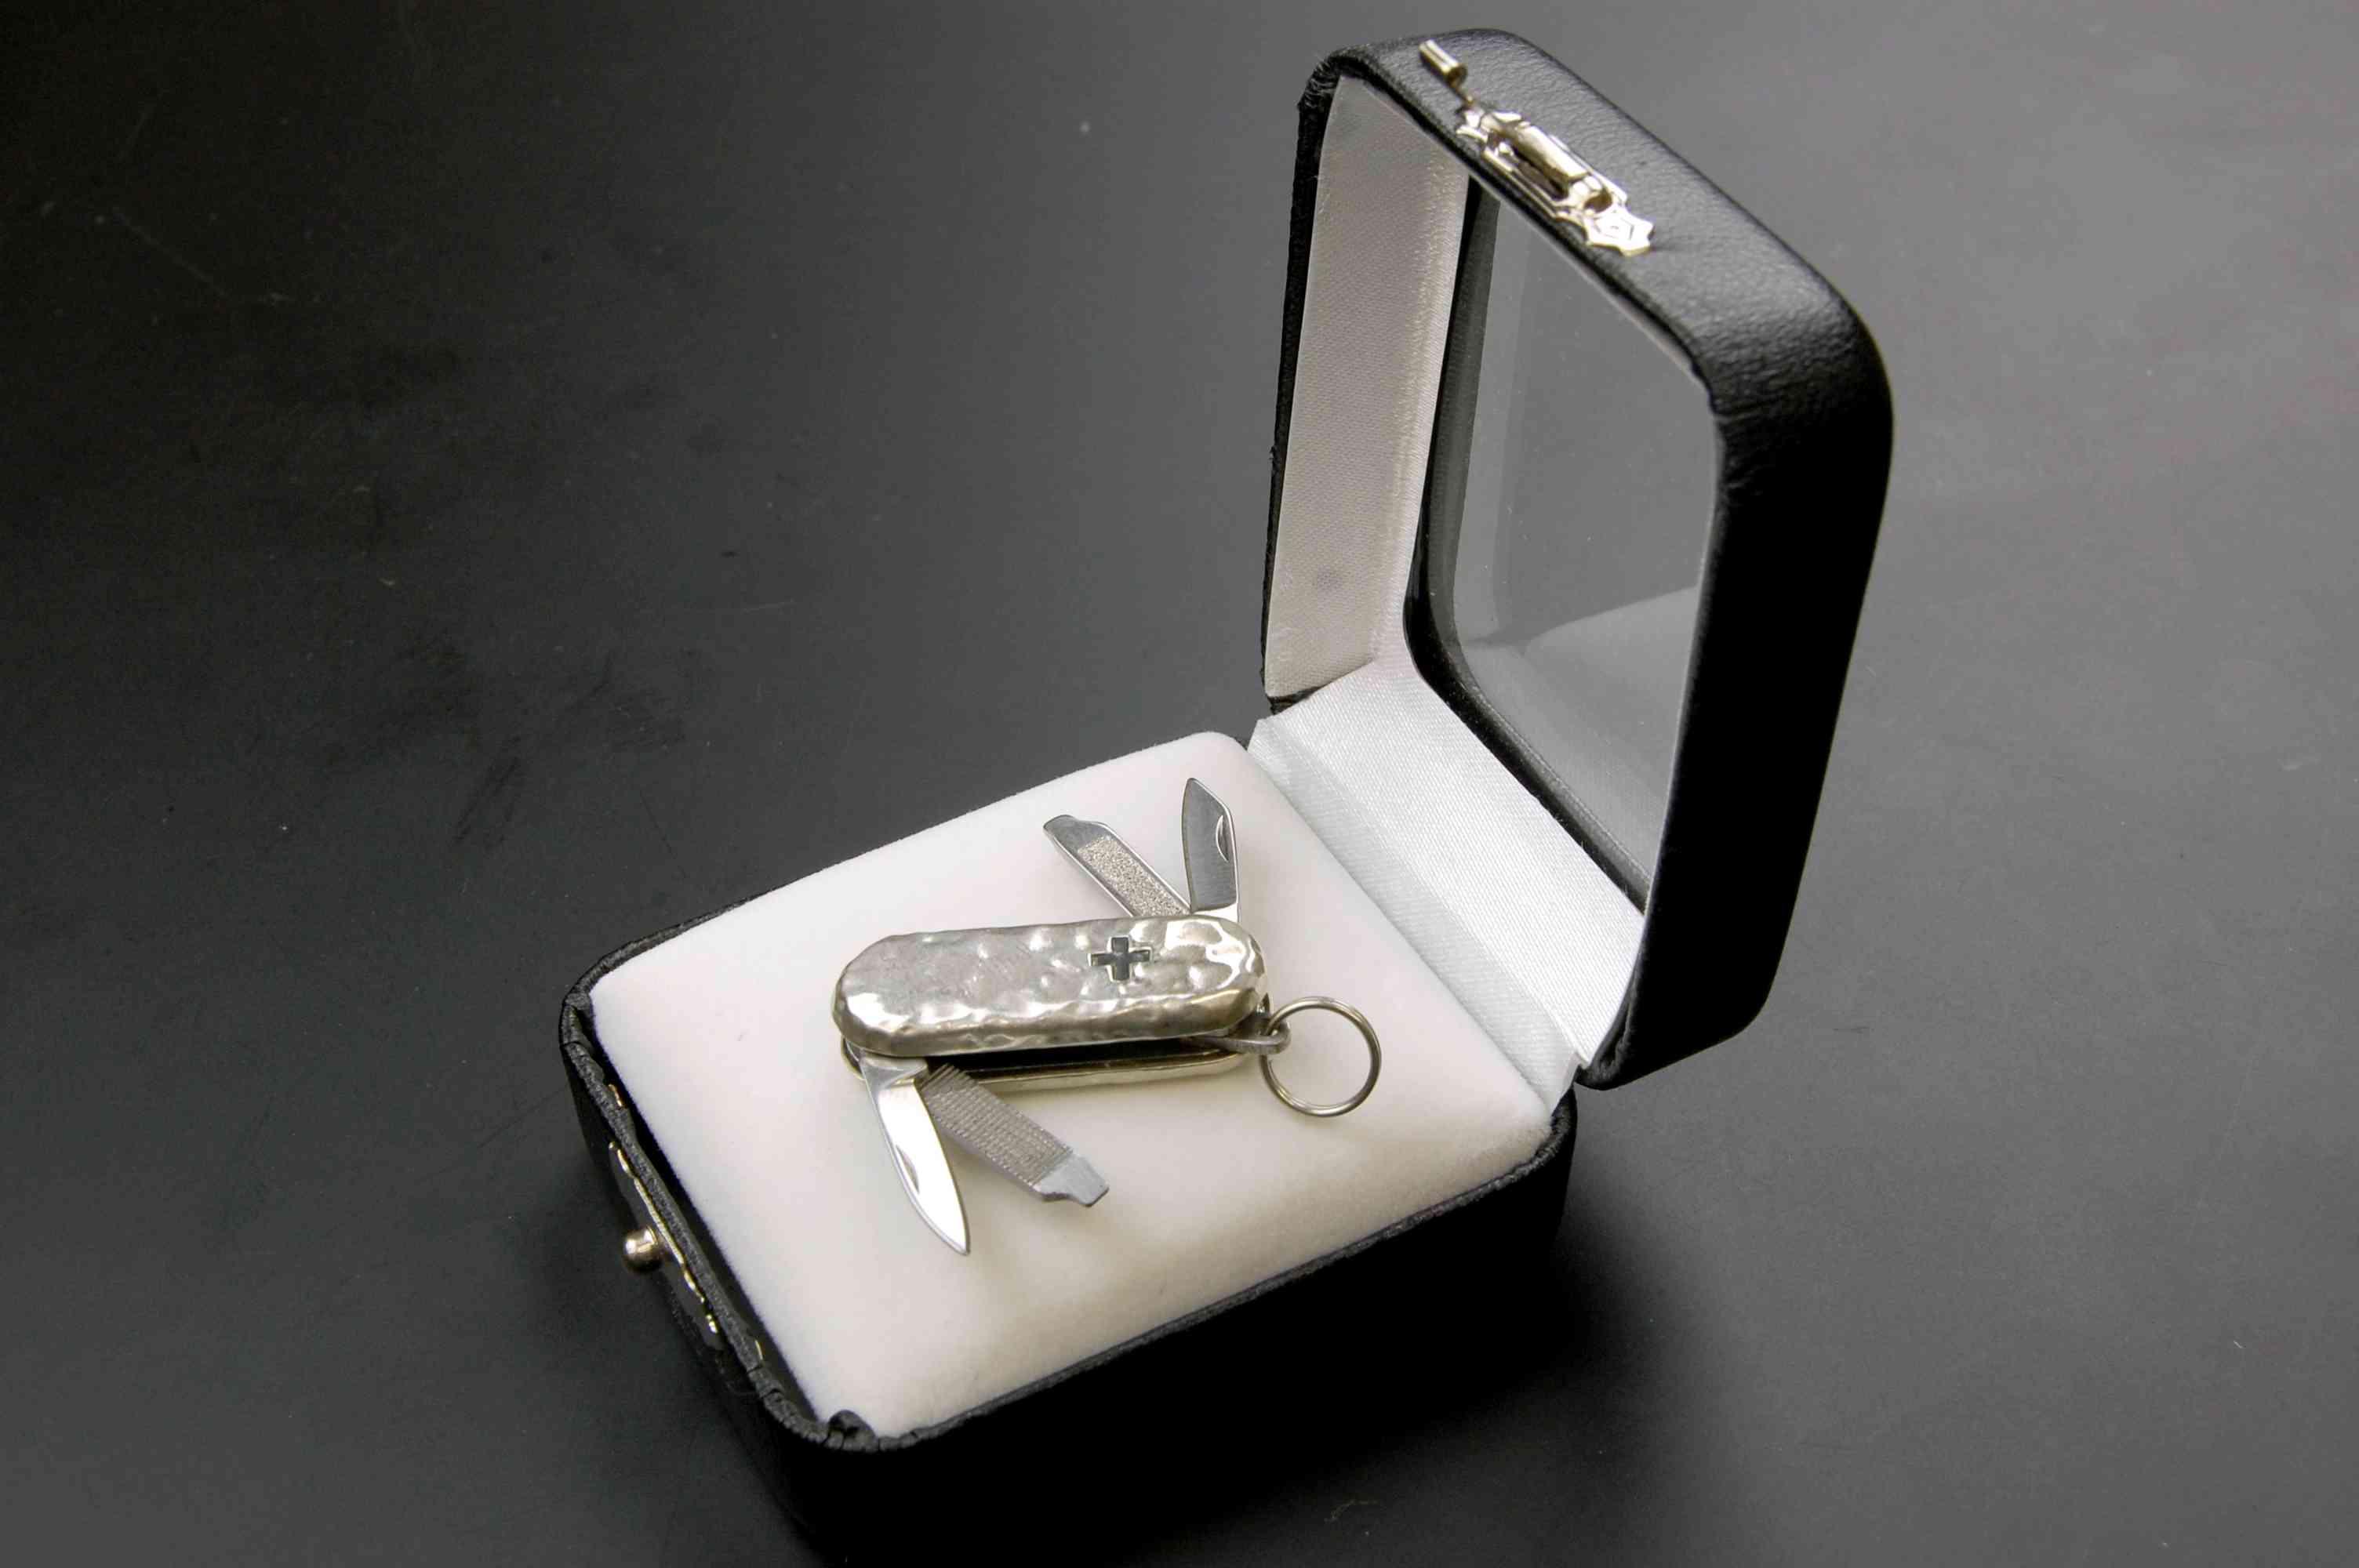 EG純銀ジッパーナイフ